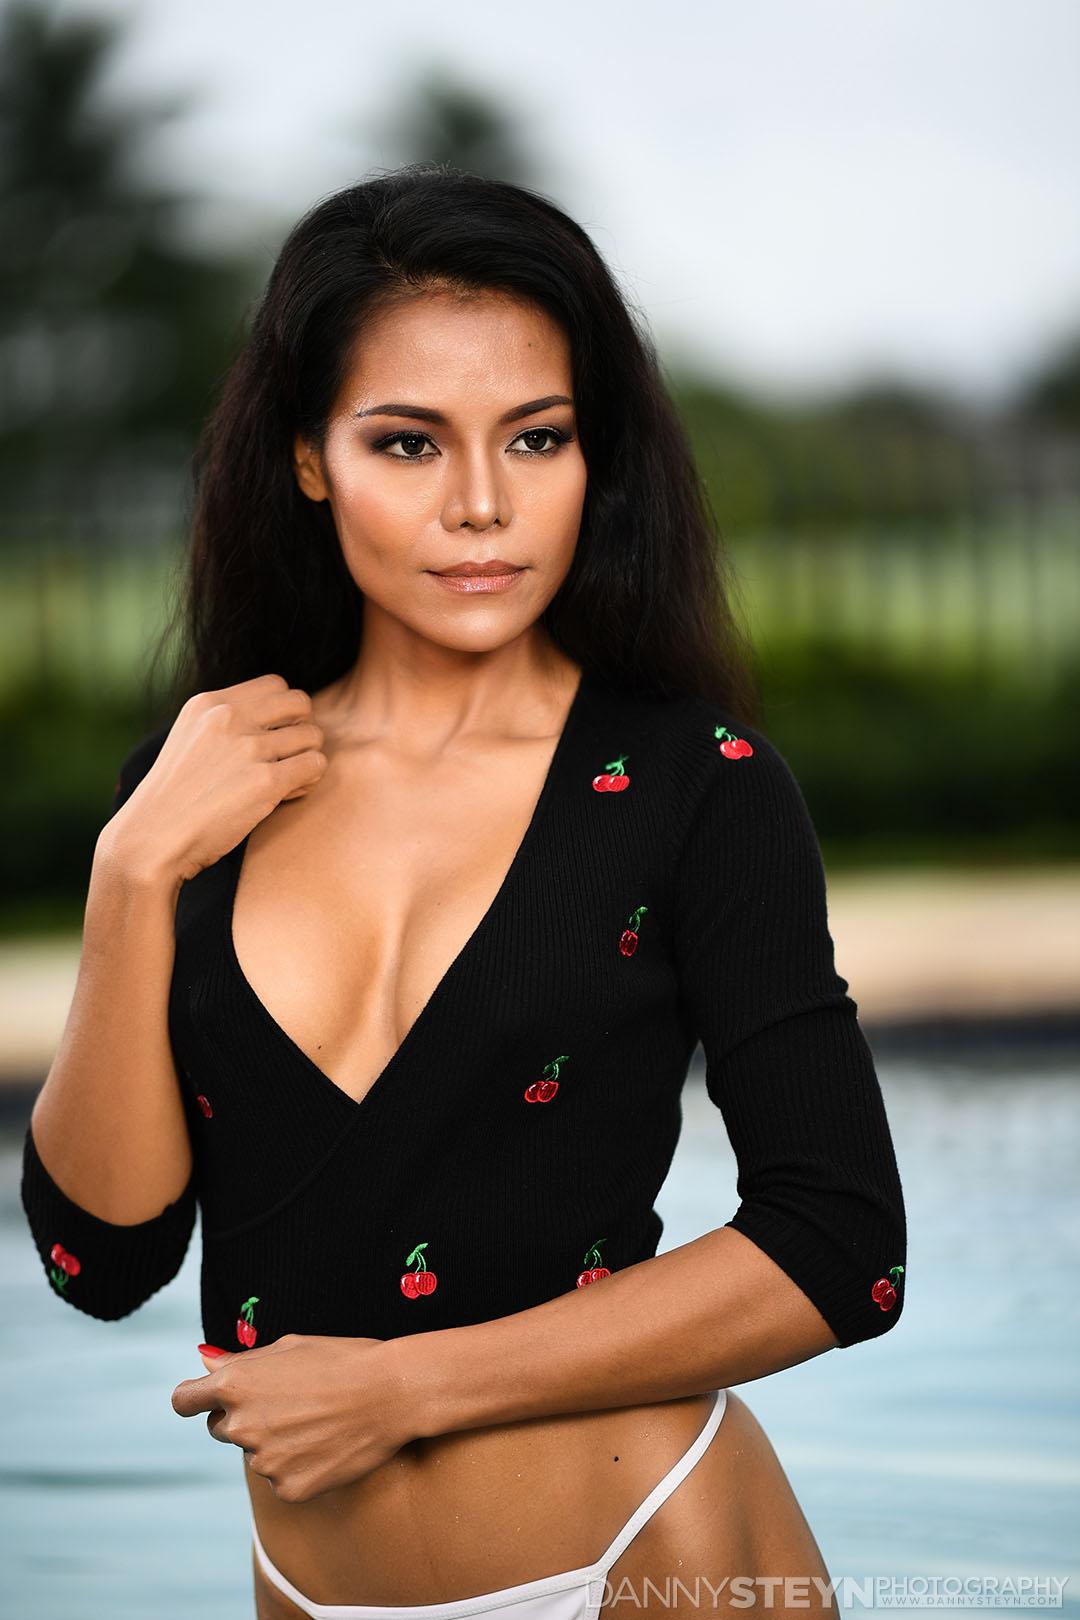 South Florida Glamour Model Photographer